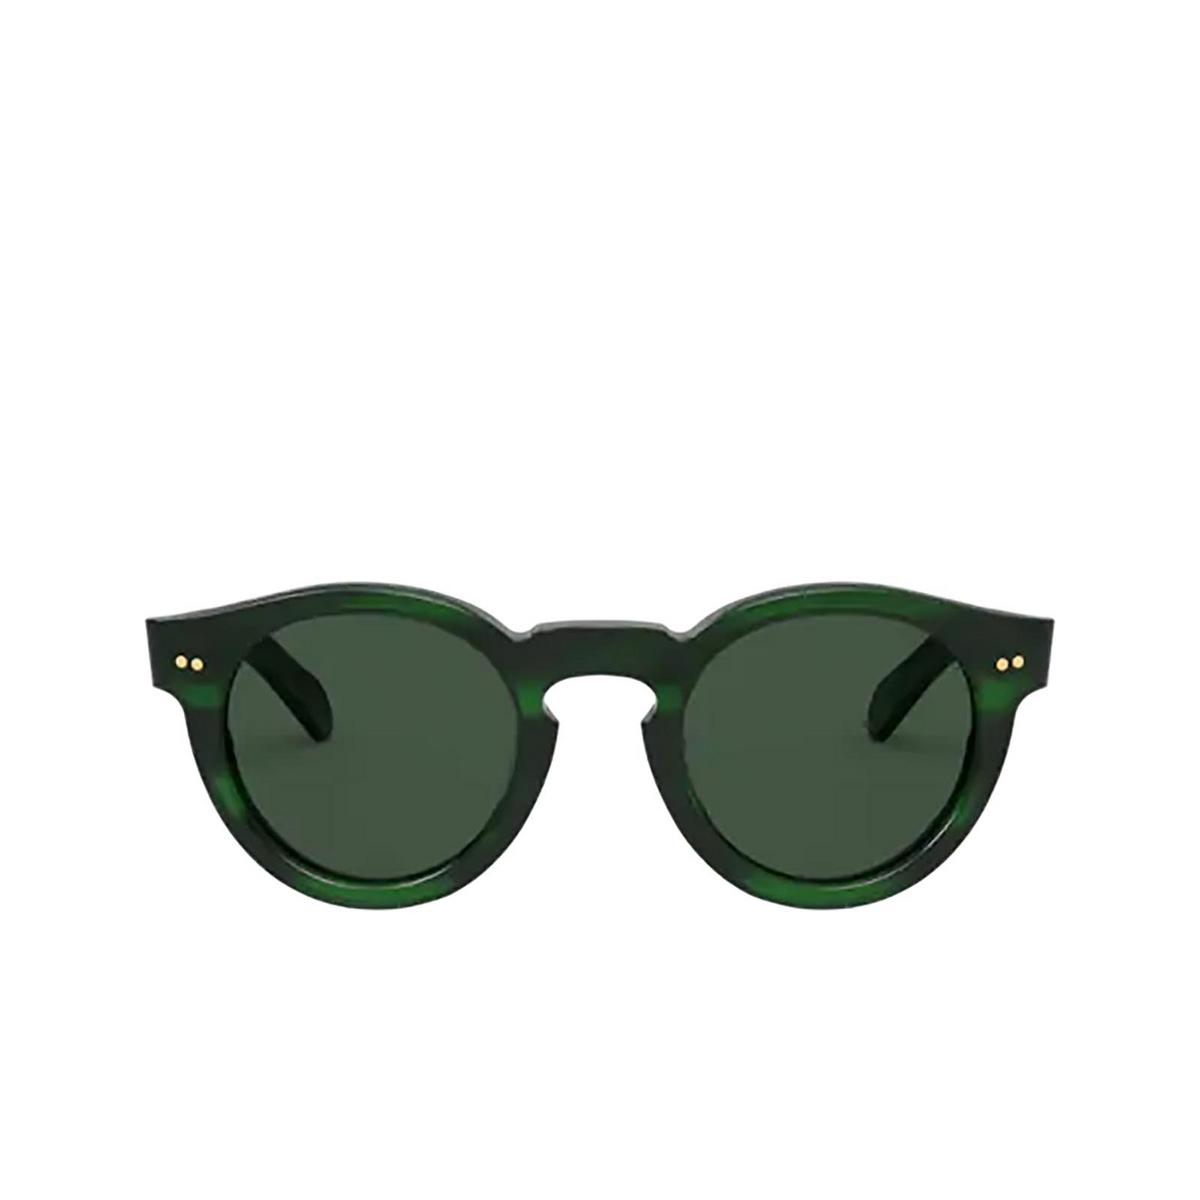 Polo Ralph Lauren® Round Sunglasses: PH4165 color Shiny Green Havana 512571 - front view.